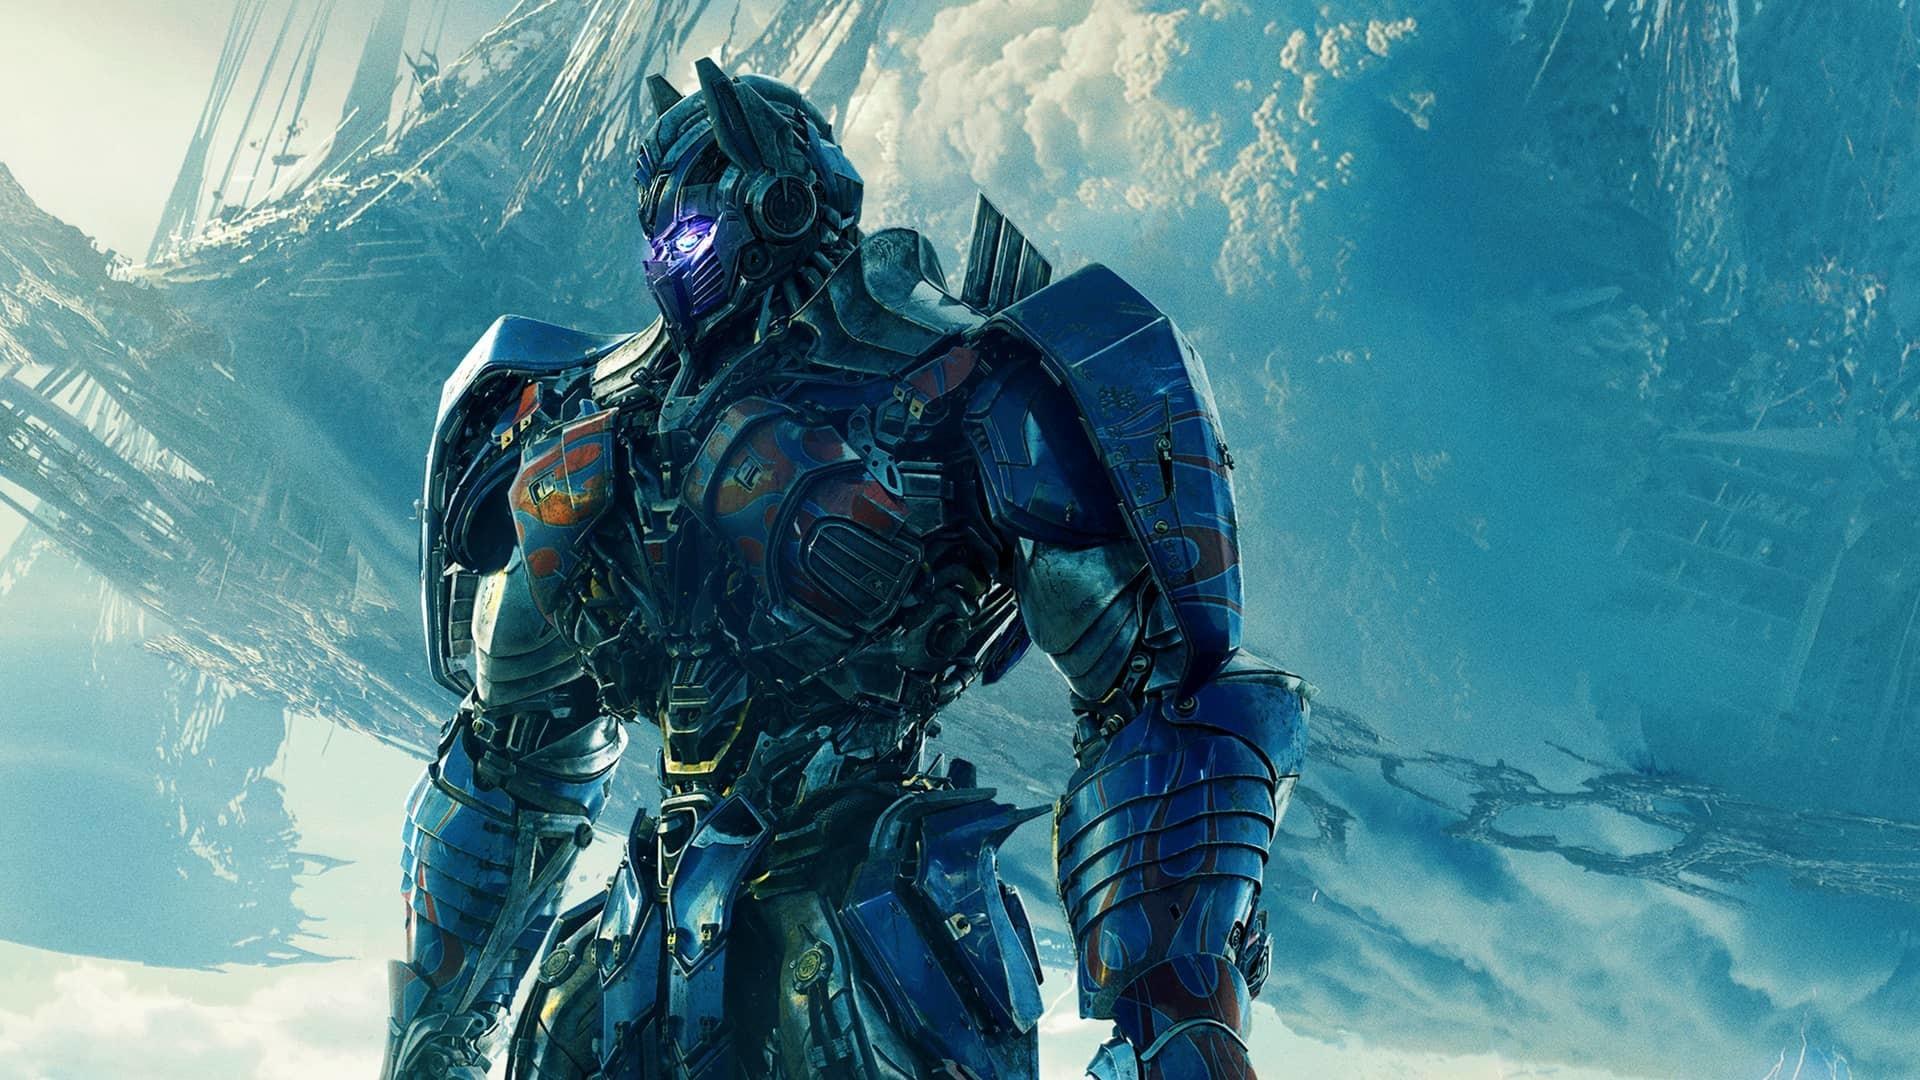 Optimus Prime Transformers The Last Knight 2017 Hd - Transformers 5 Optimus Prime Profile - HD Wallpaper